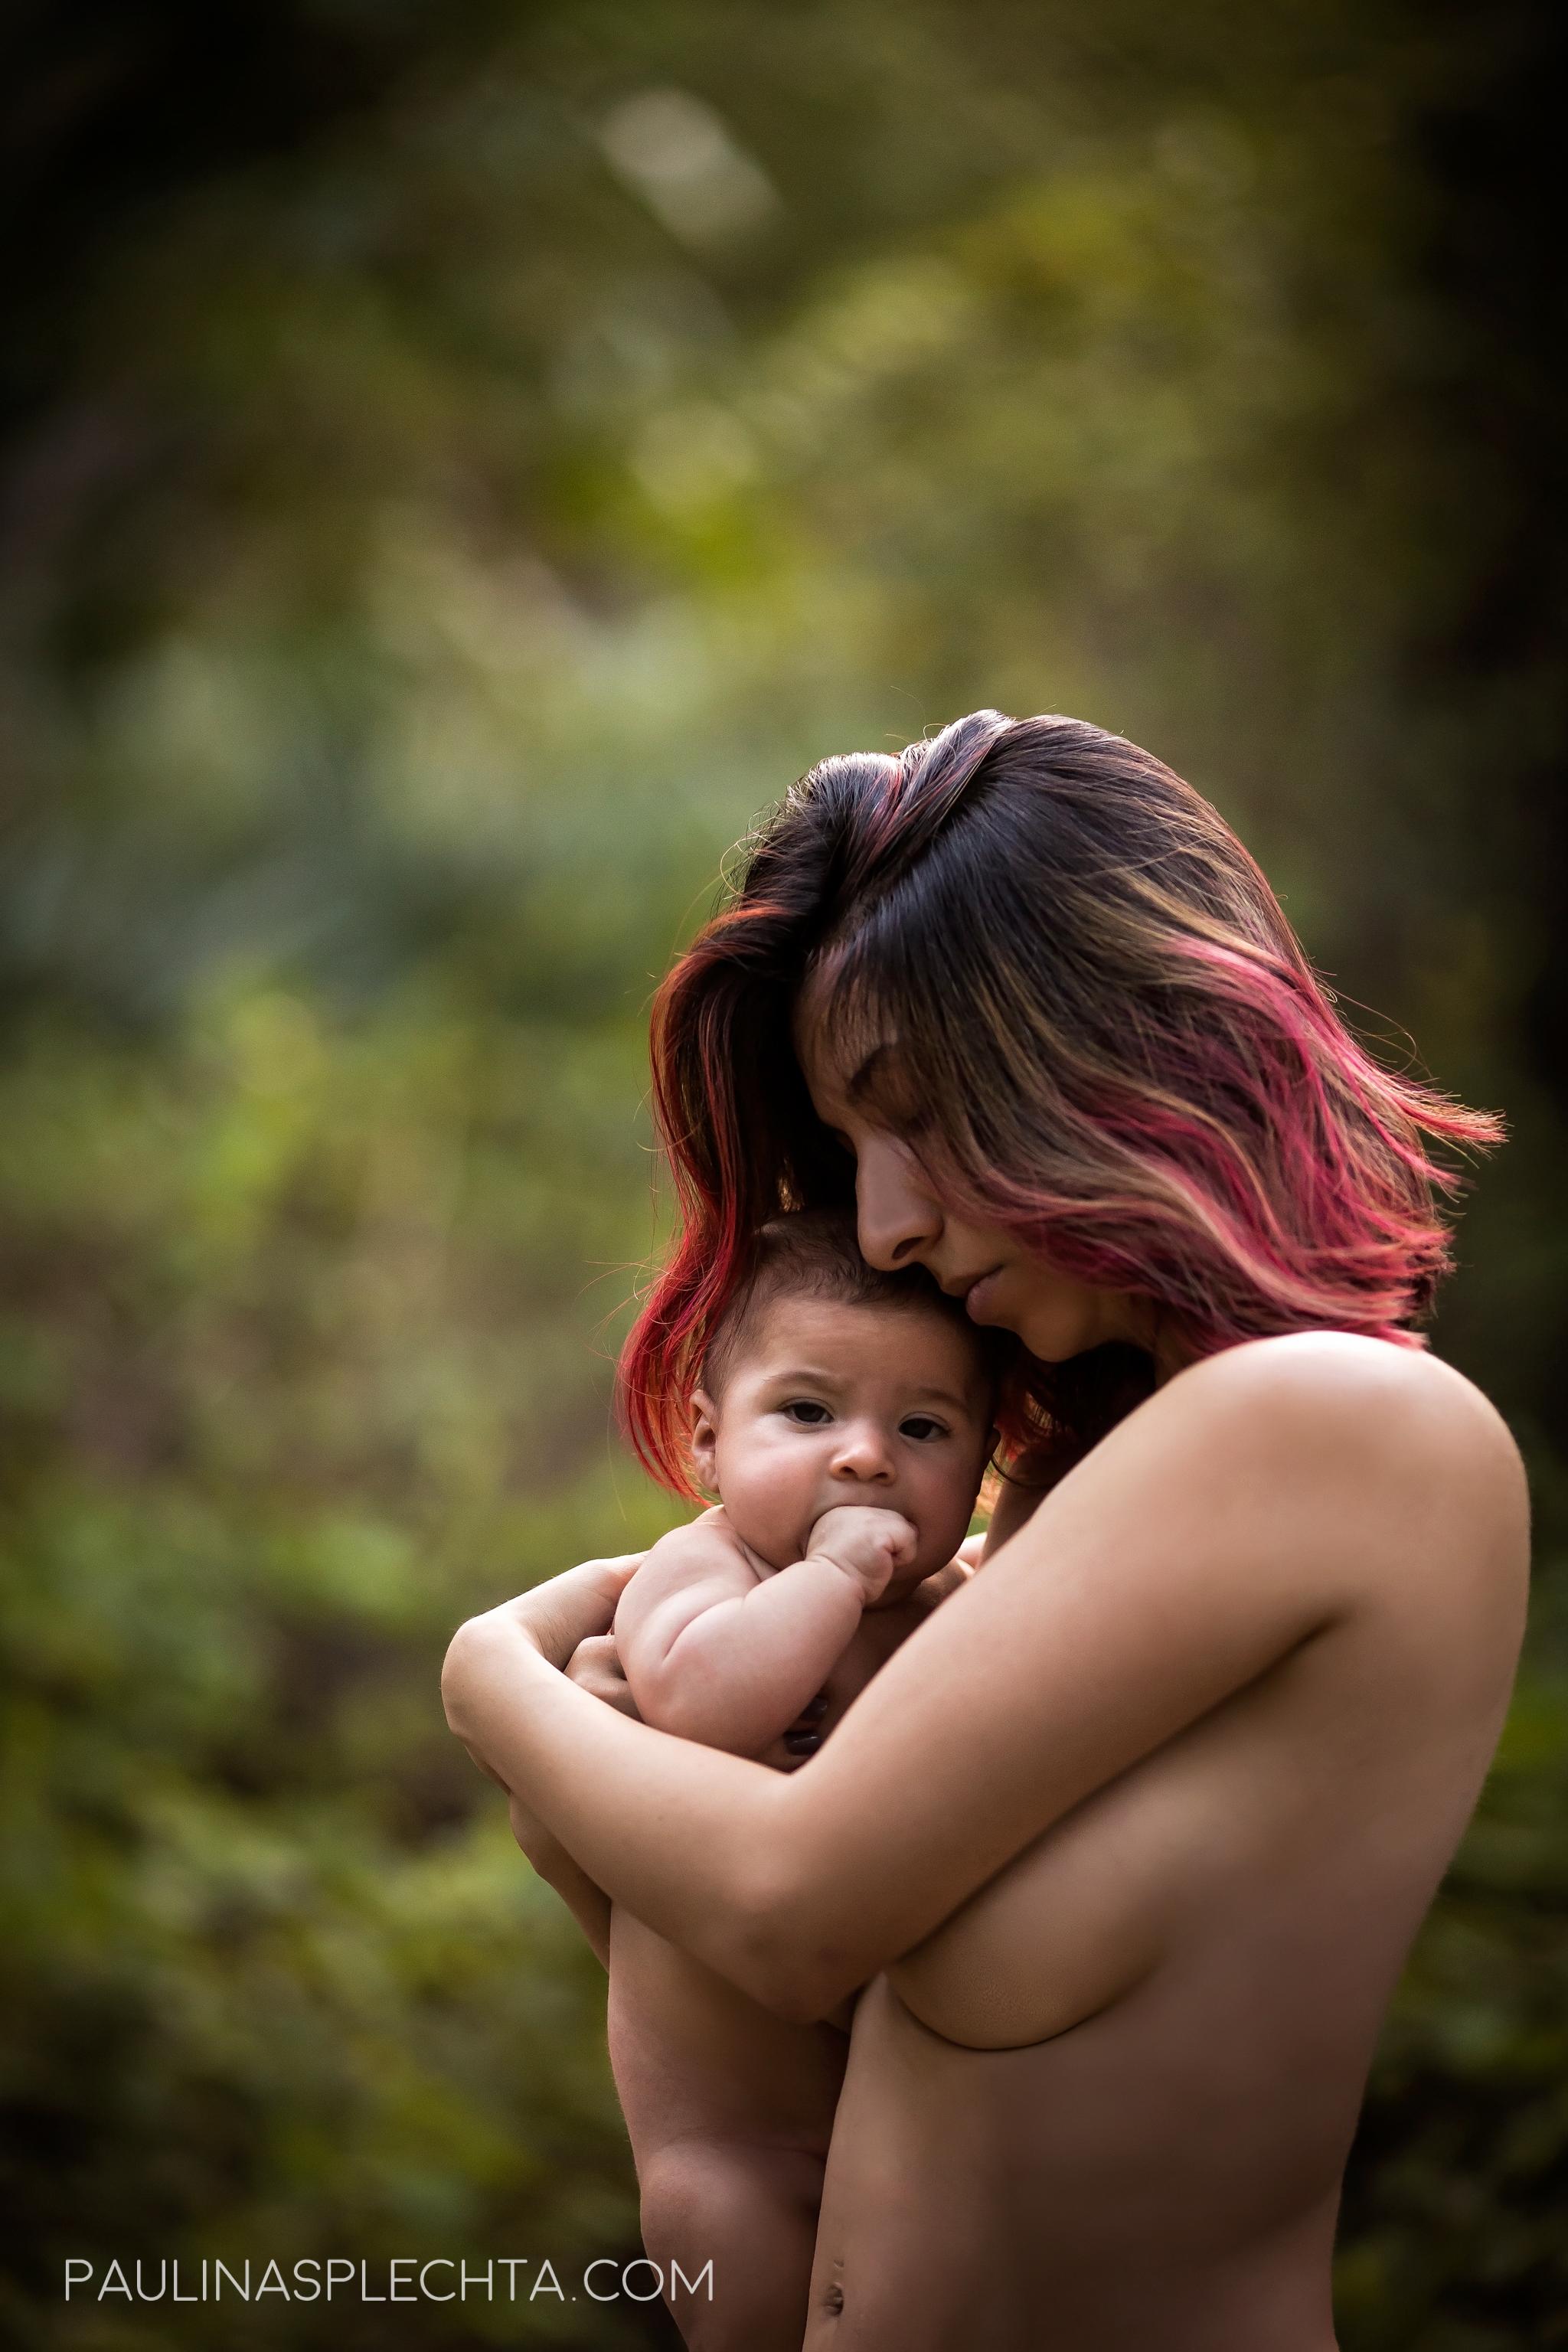 boca-raton-regional-hospital-vbac-car-birth-christine-hackshaw-kathy-fair-baby-bump-mommy-and-me-family-photographer-birth-5-2.jpg